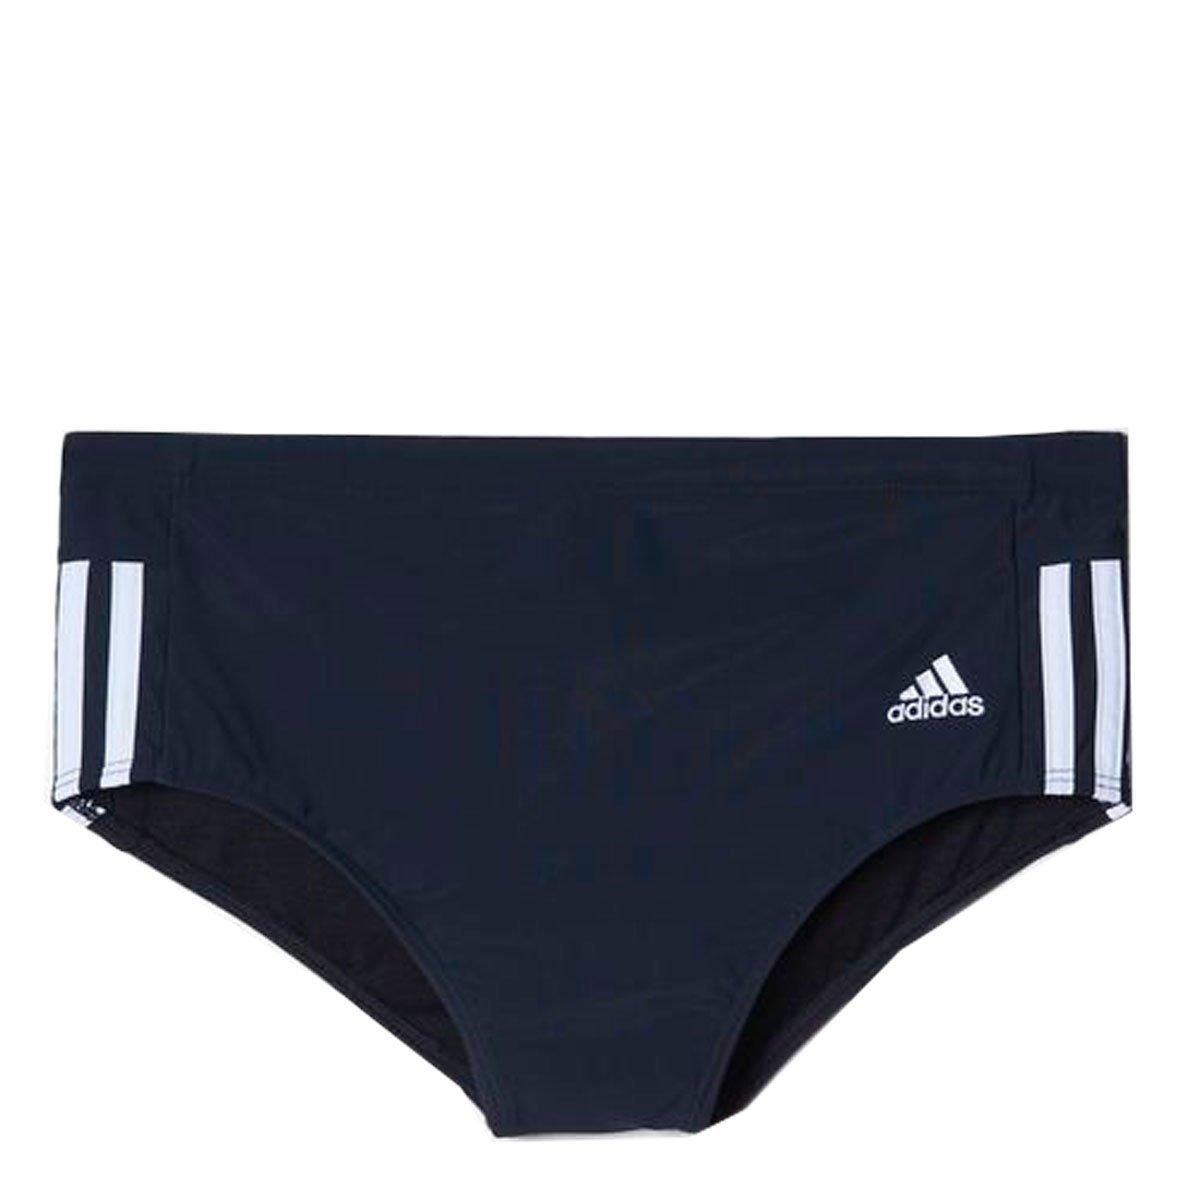 e4d4bea85 Bizz Store - Sunga Media Core Adidas Adulto AK1715